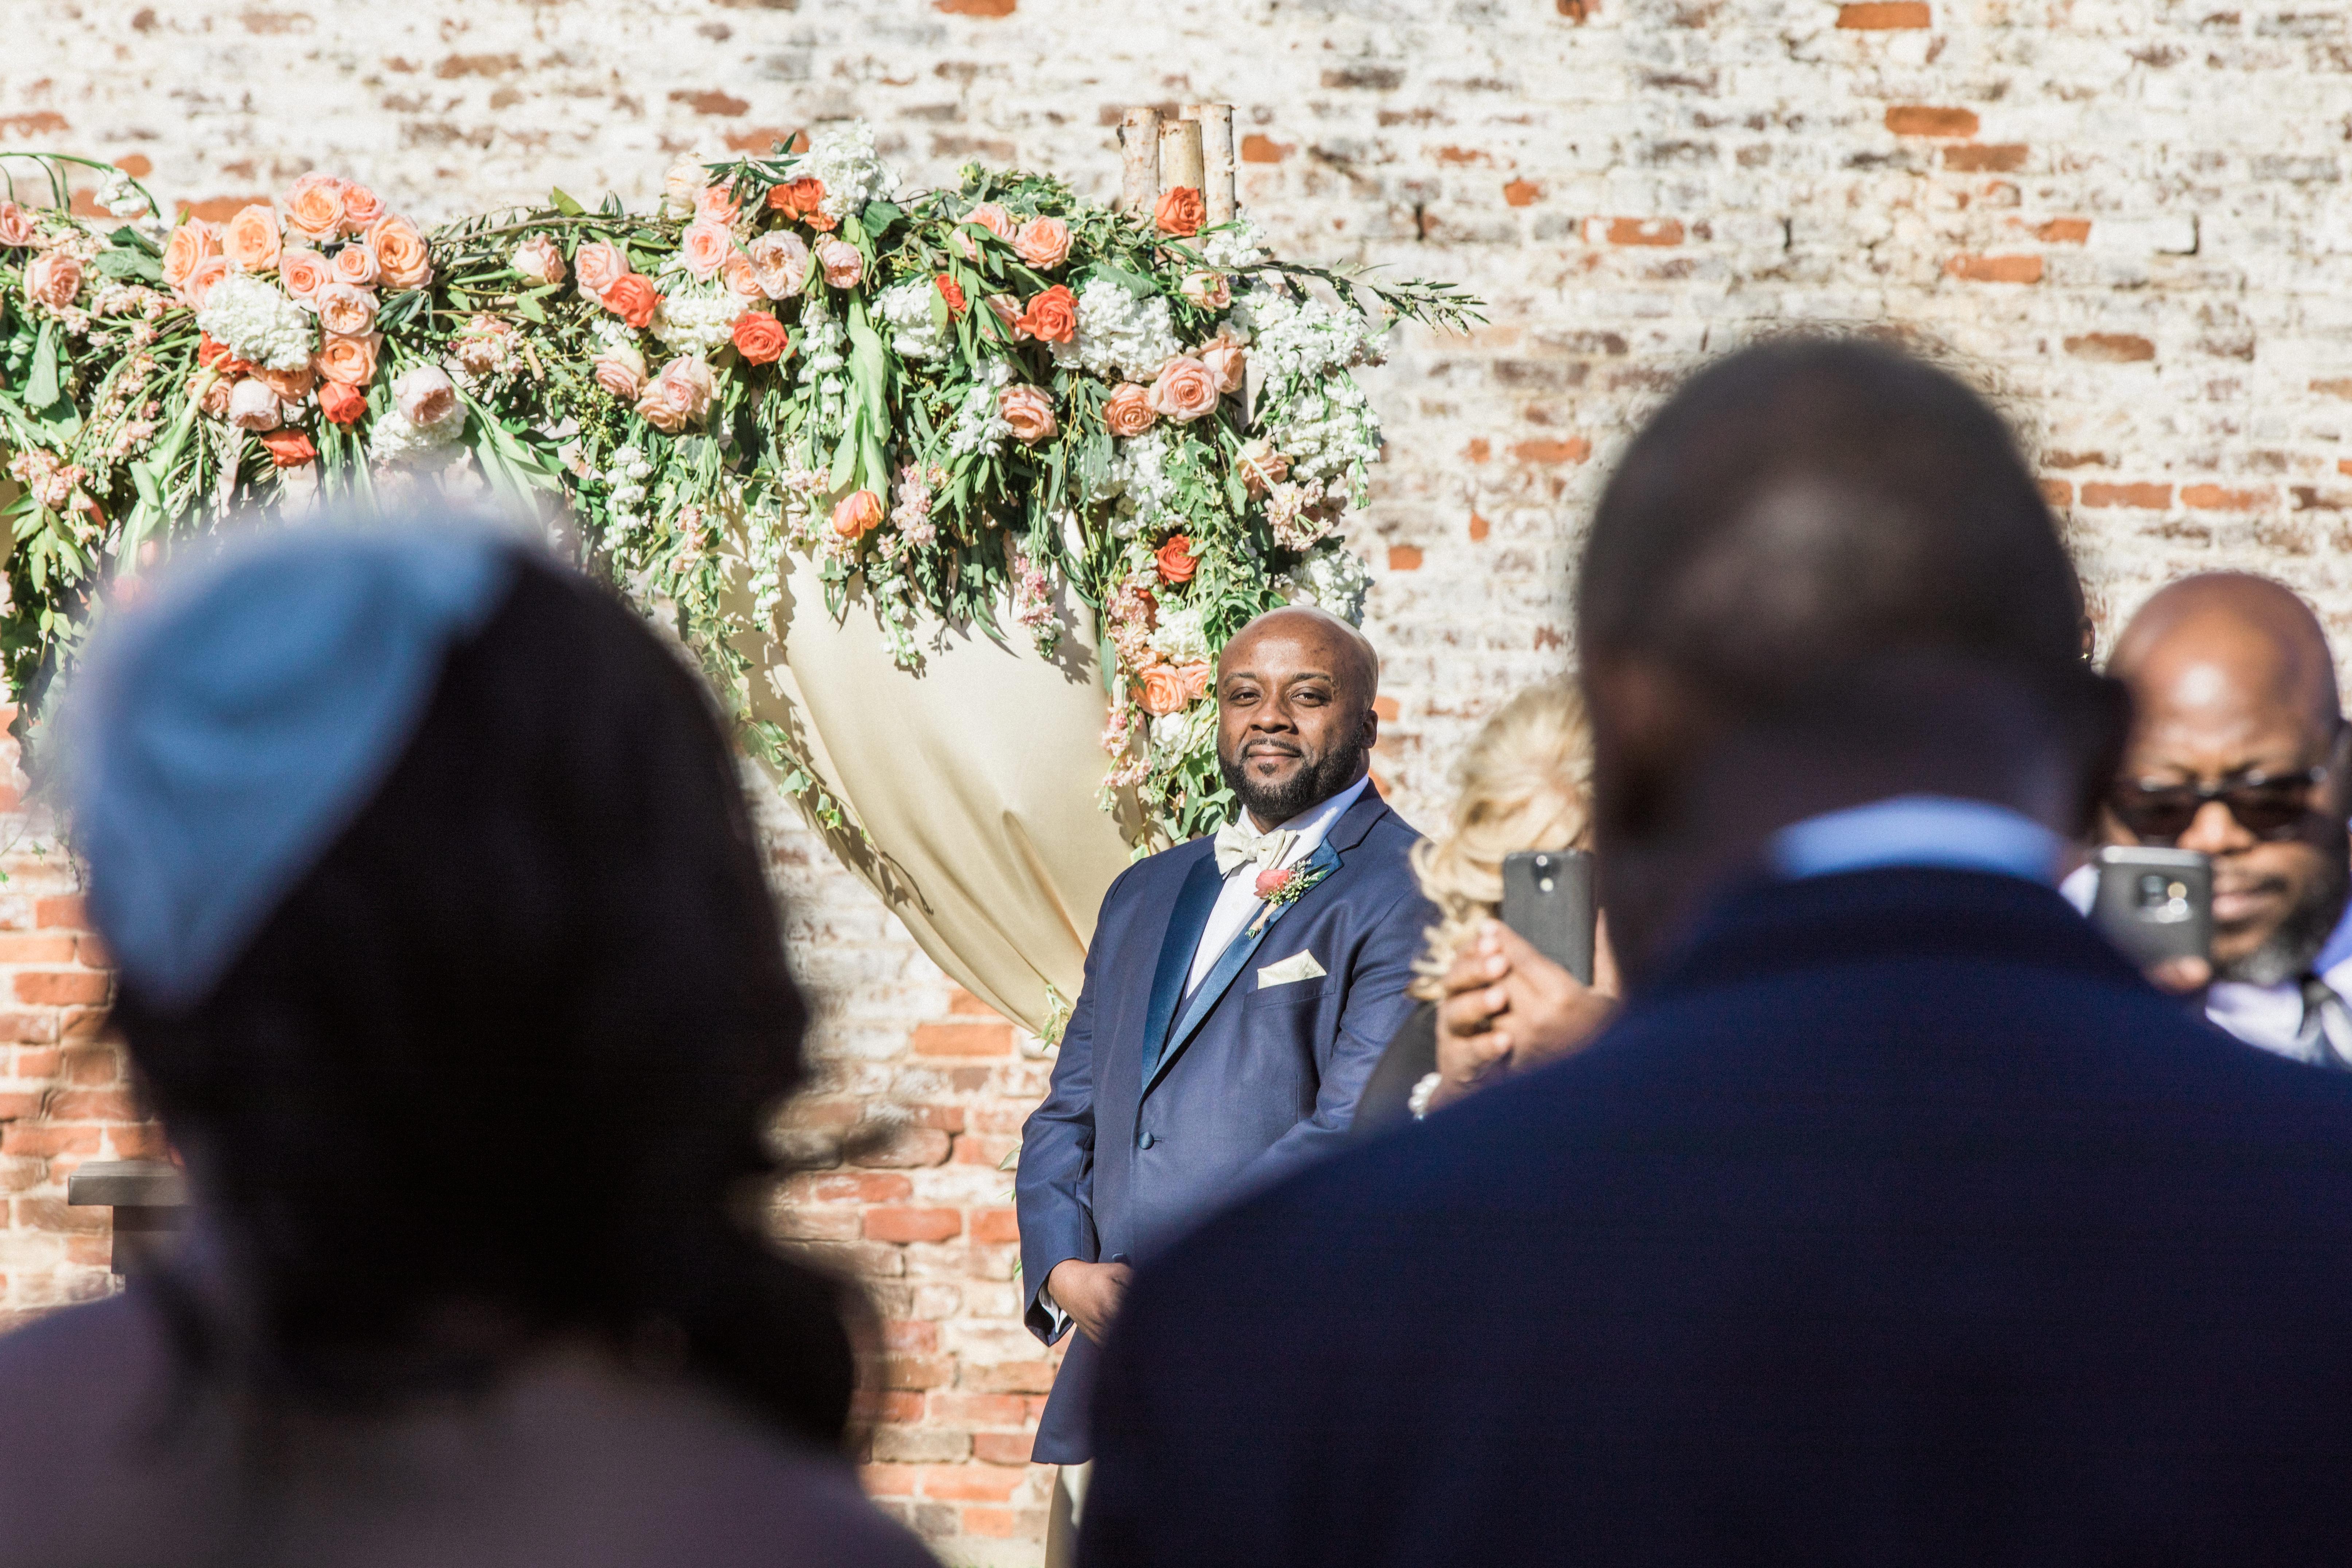 FLOWERS_WEDDING_SELMA_ALABAMA_WEDDING_PHOTOGRAPHY_80